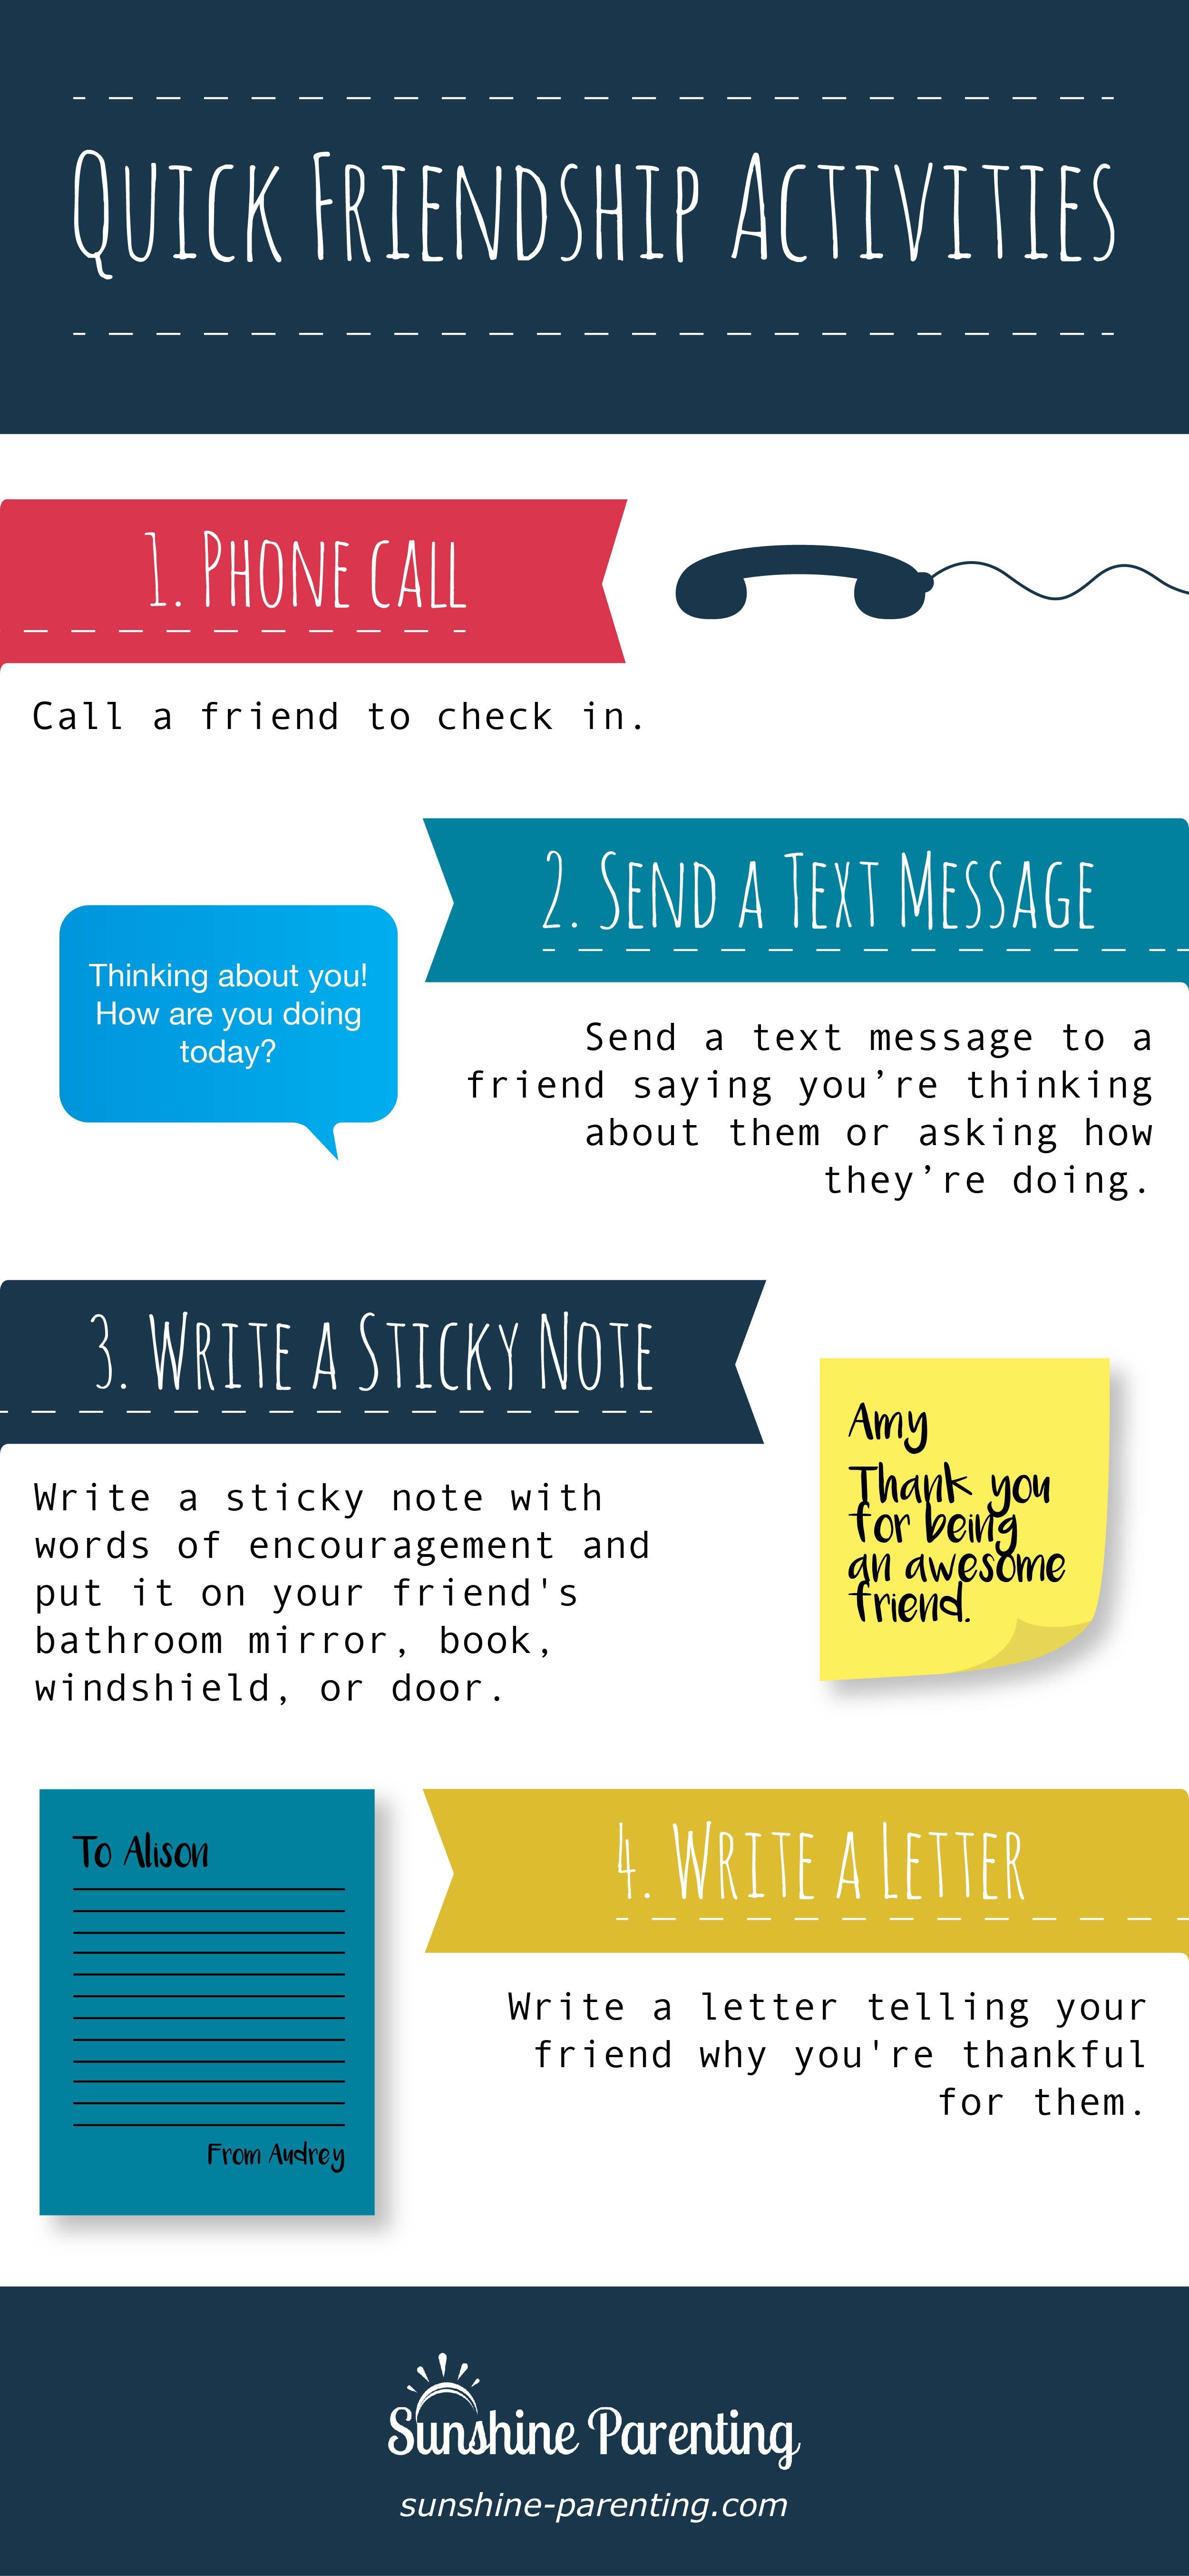 quick-friendship-activities-2-v2